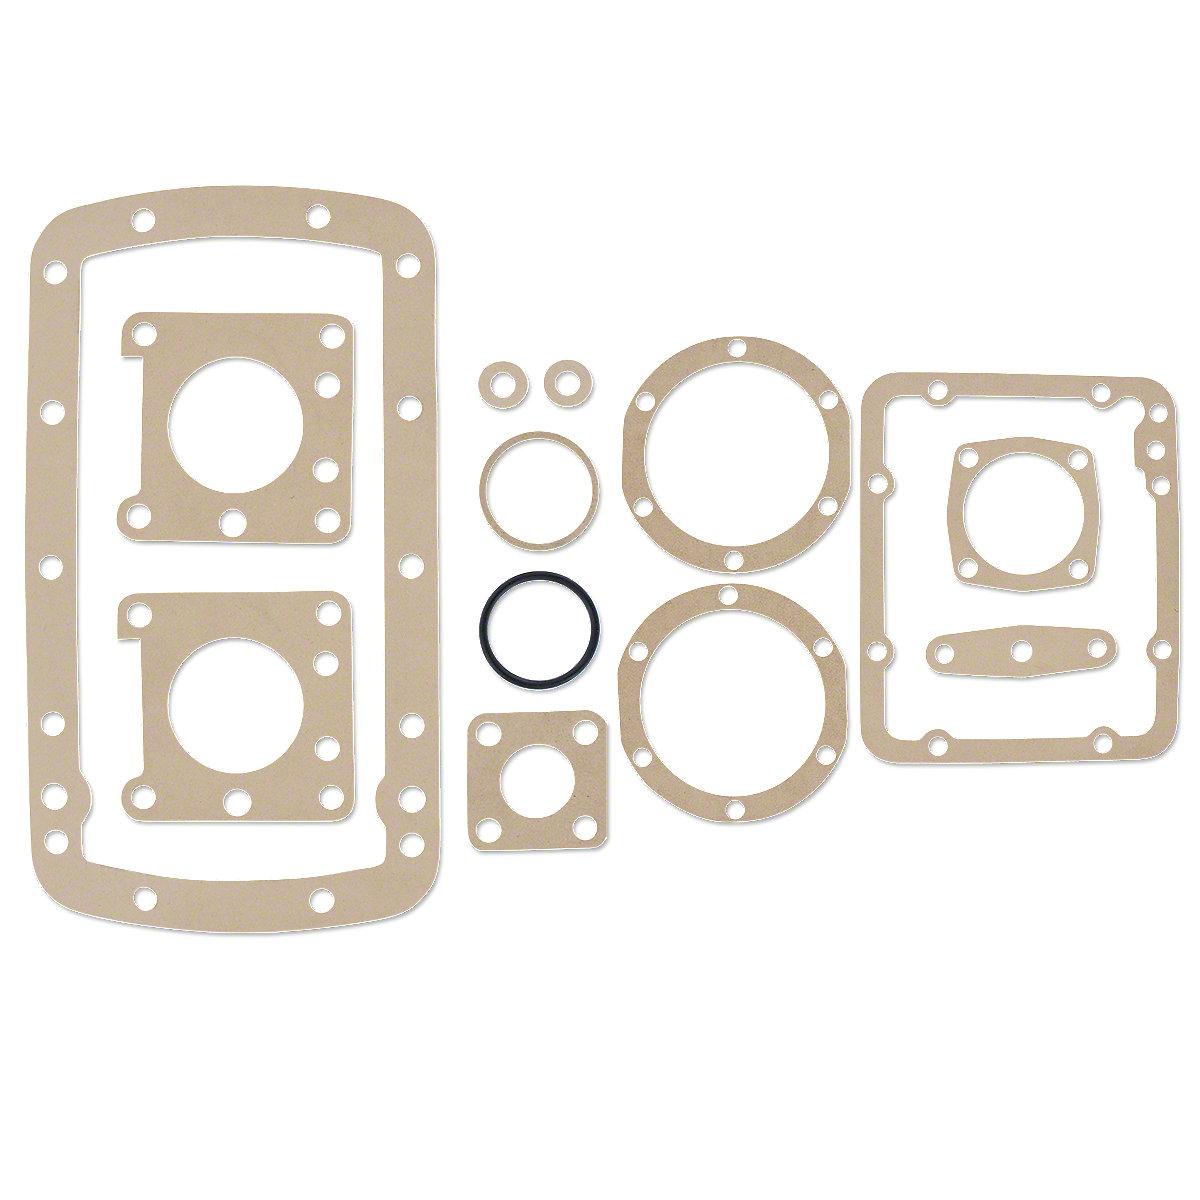 Hydraulic lift cover repair gasket kit for massey ferguson te20